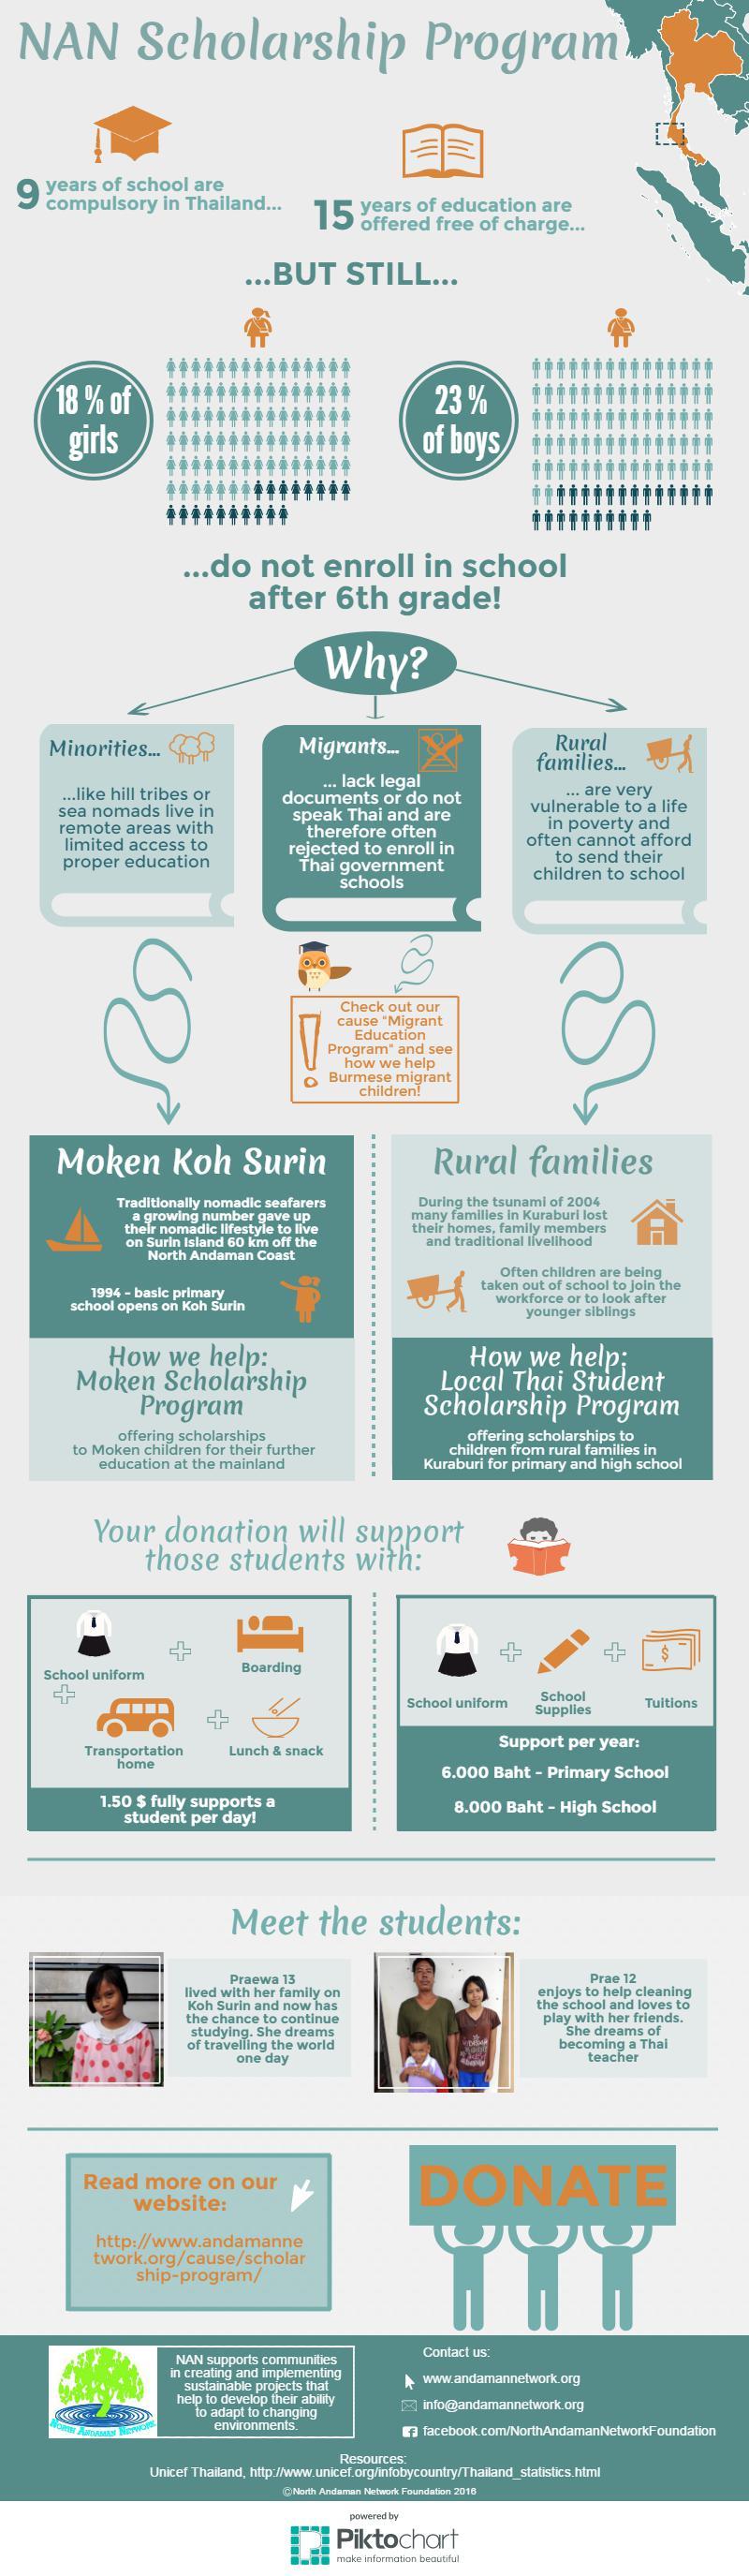 nan-scholarship-program